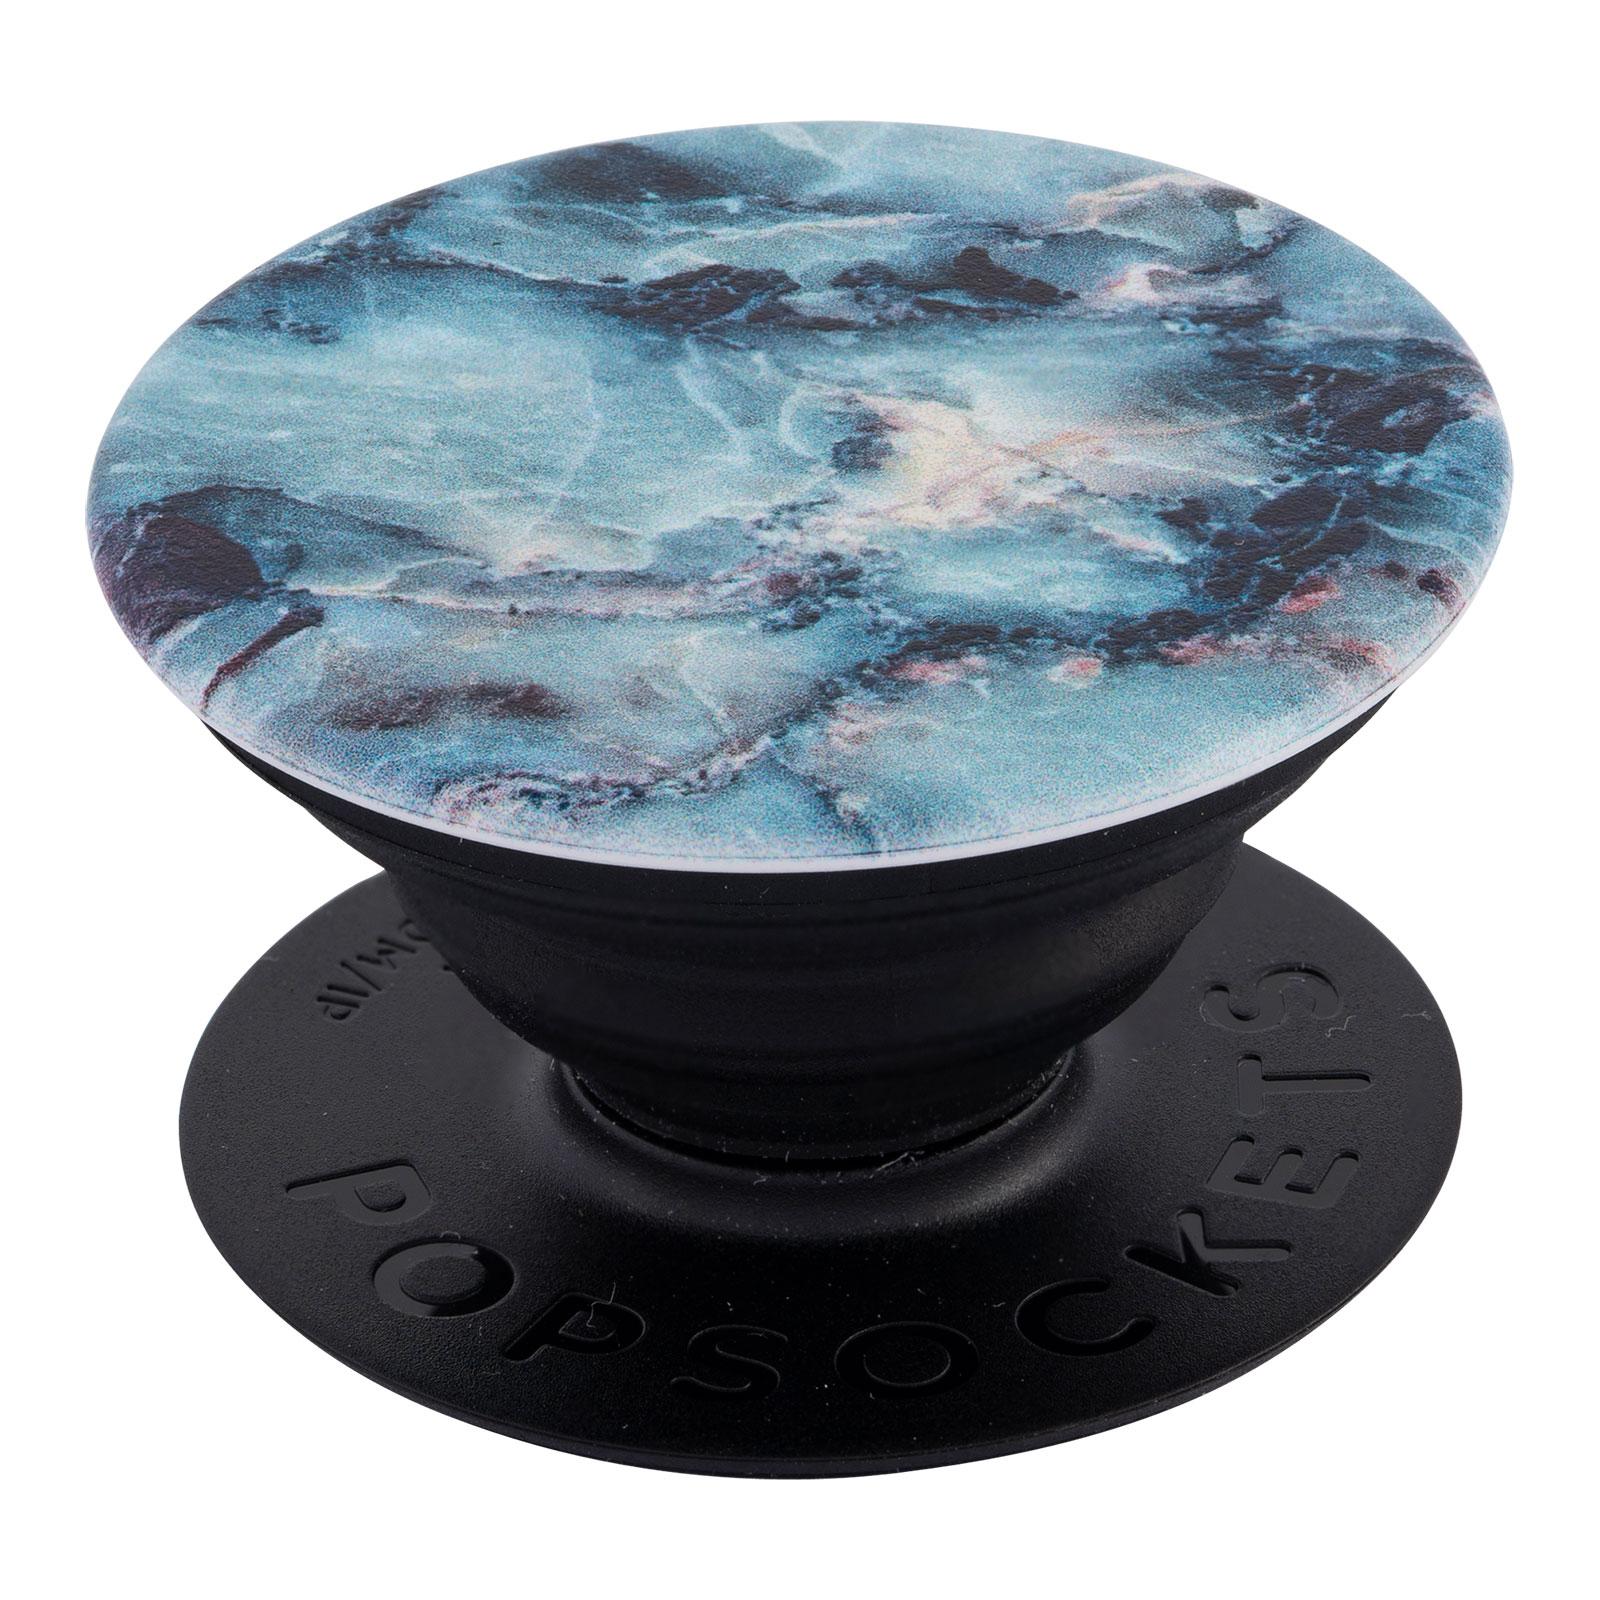 Popsocket Blue Marble